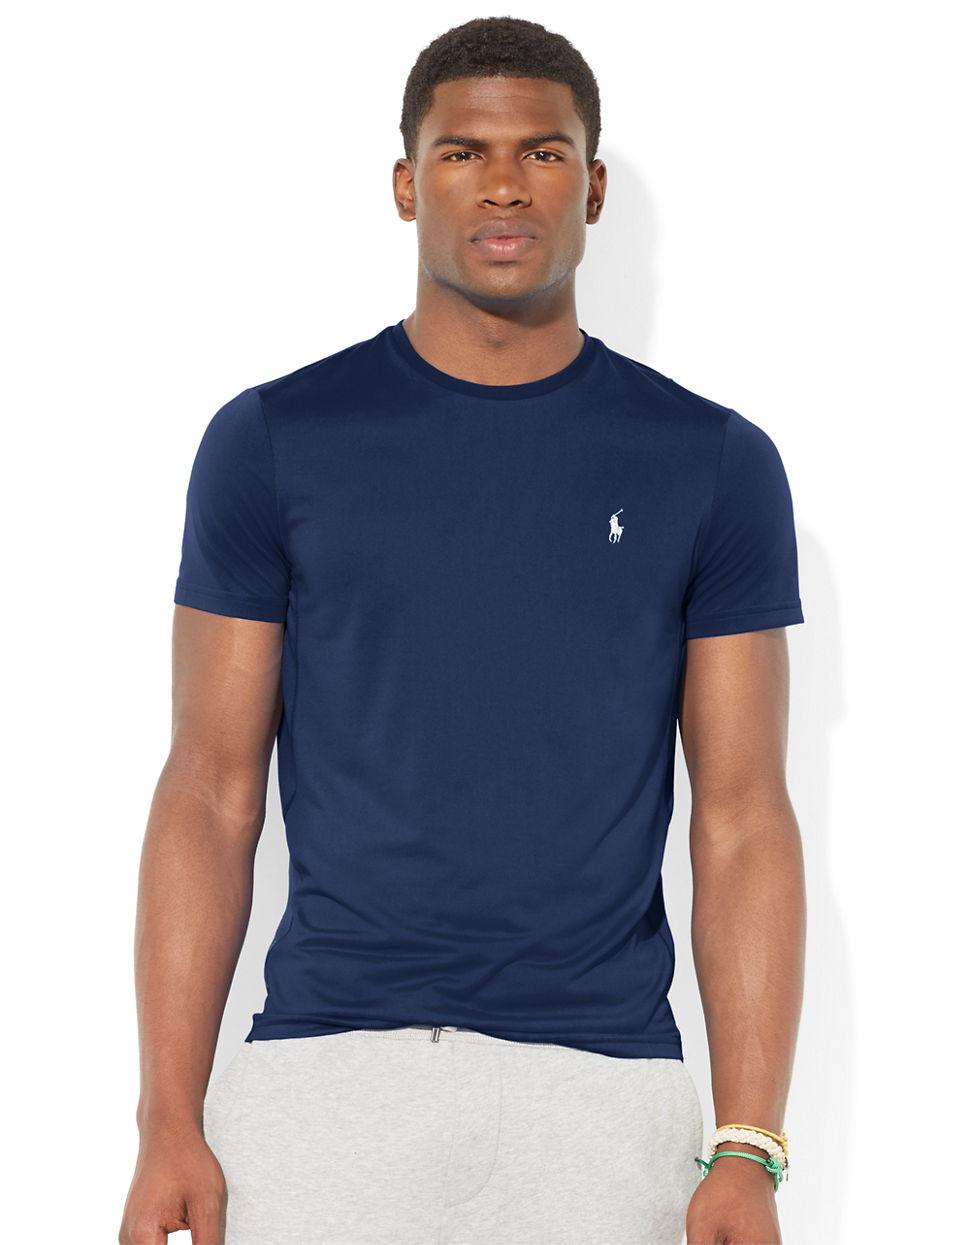 696bd514 Polo Ralph Lauren Performance Jersey Crewneck T-Shirt in Blue for ...